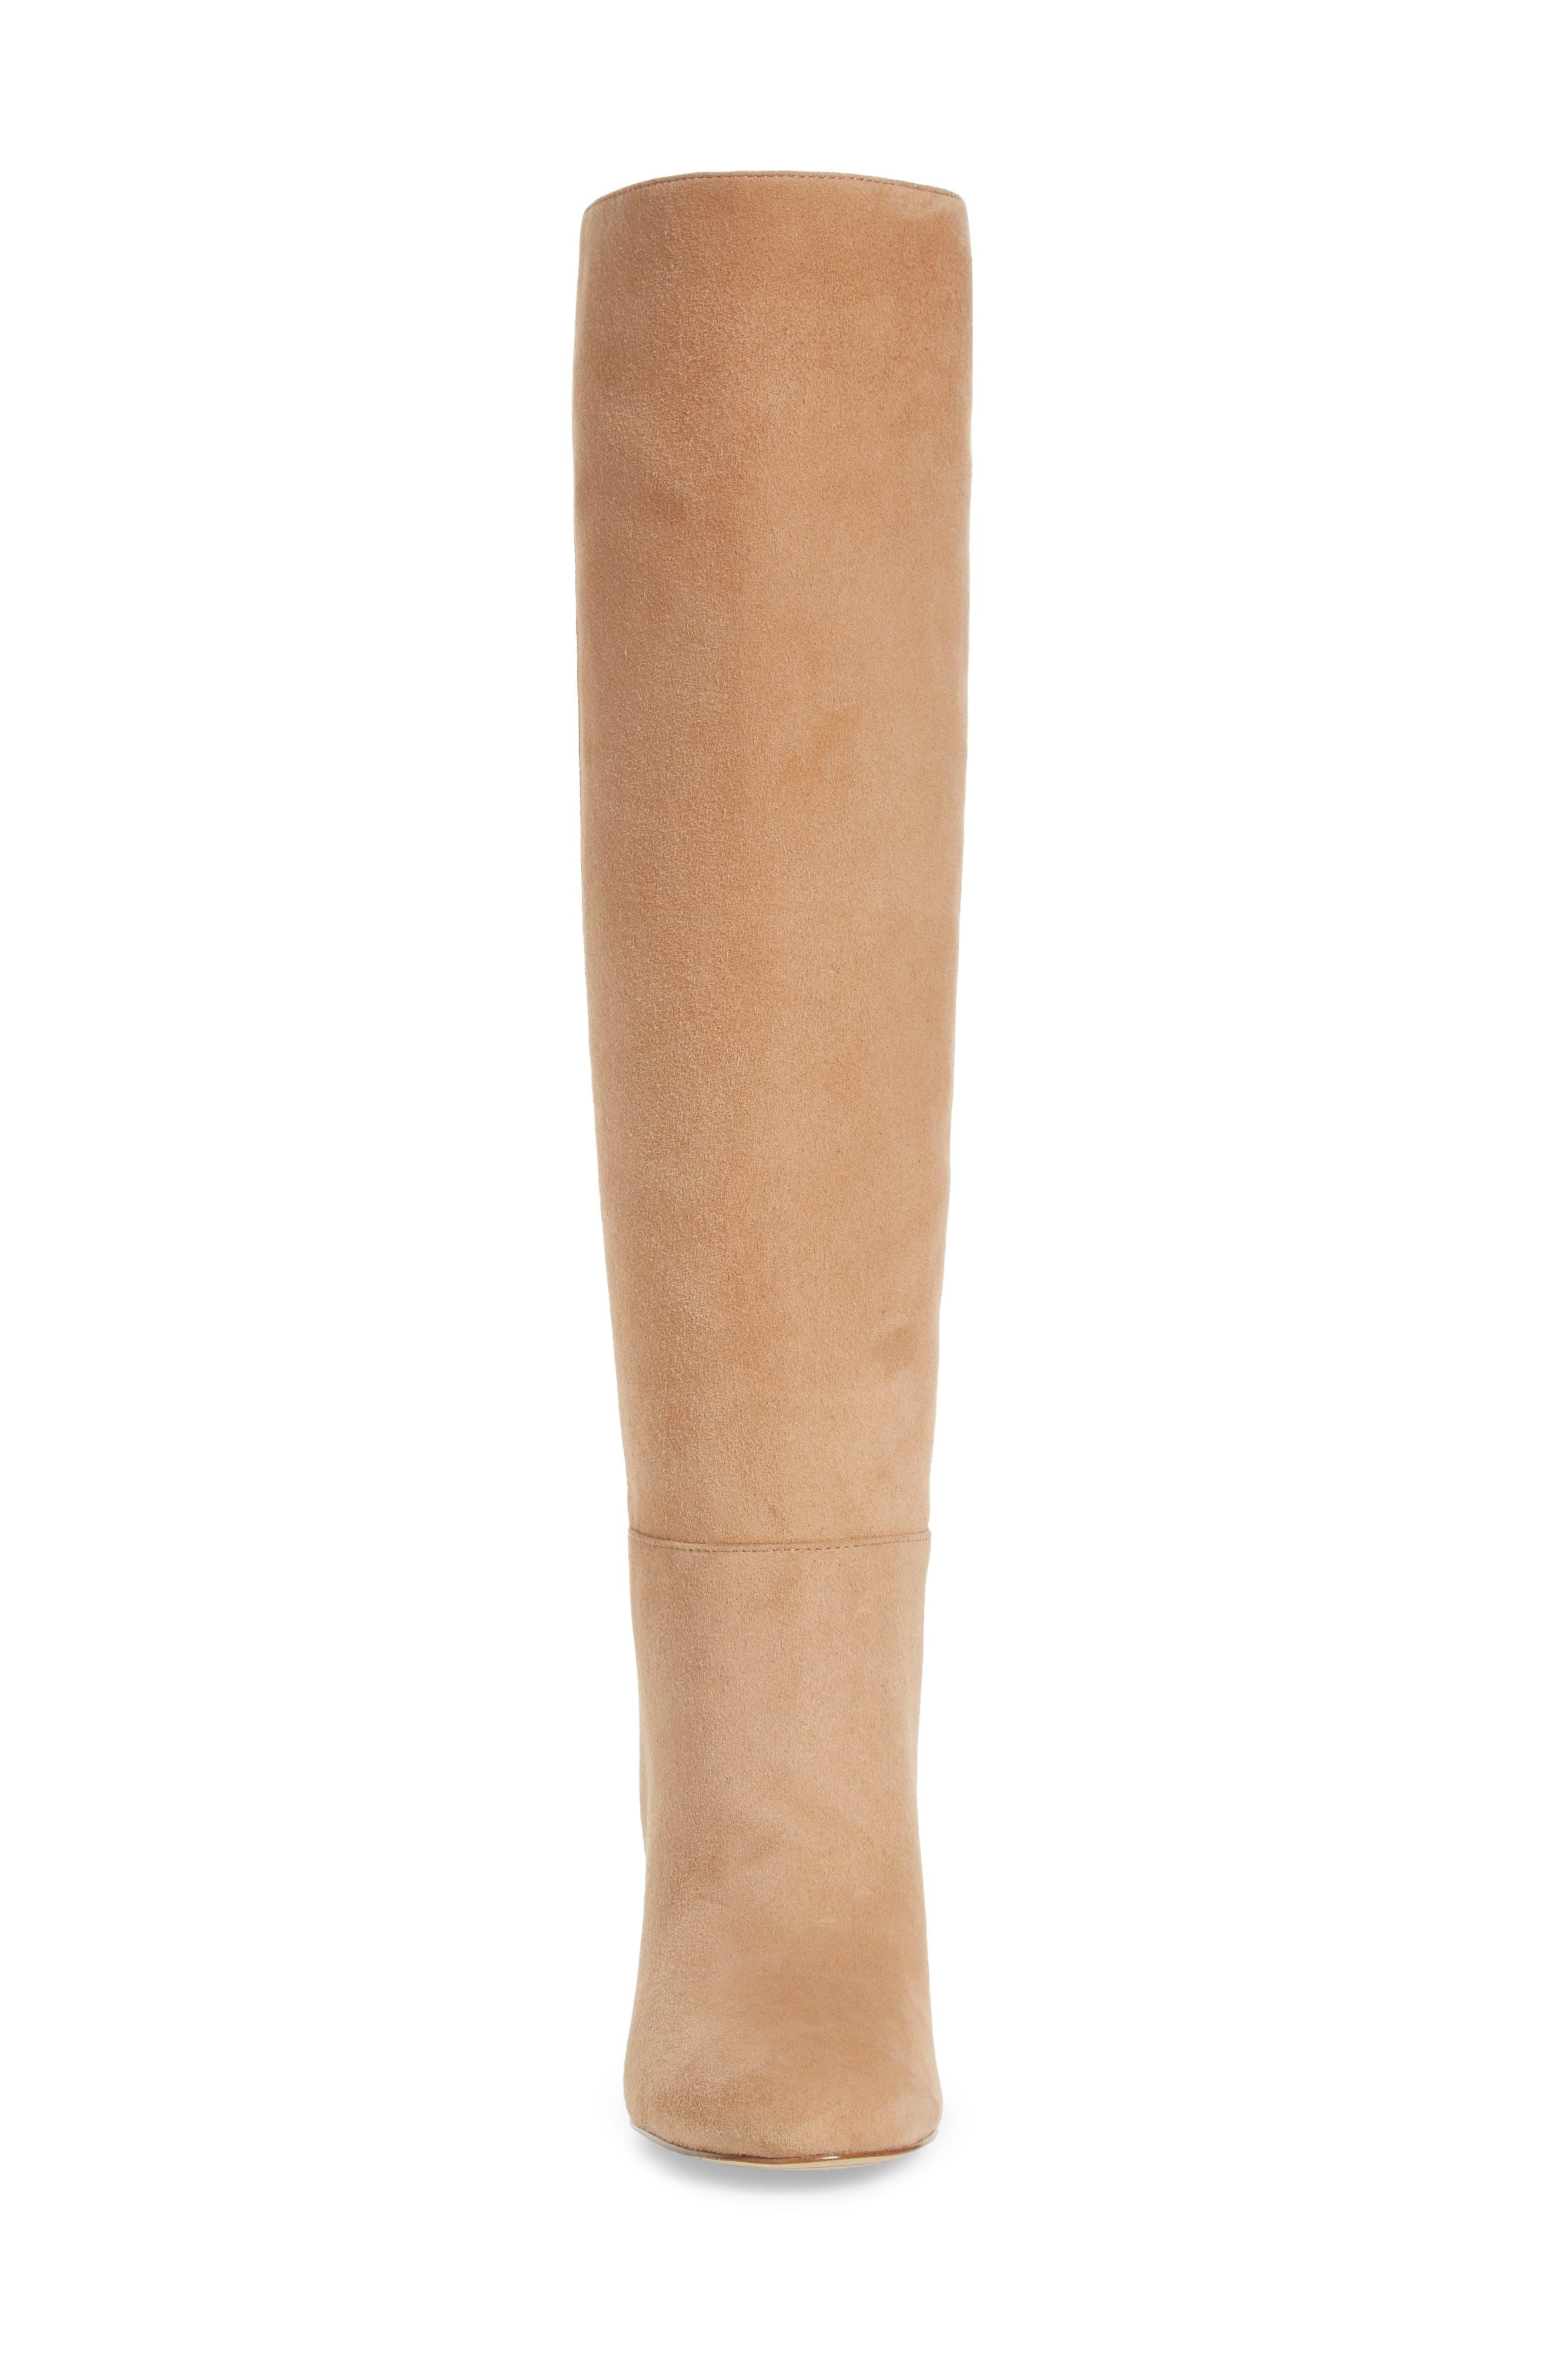 SAM EDELMAN, Caprice Knee-High Boot, Alternate thumbnail 4, color, 250